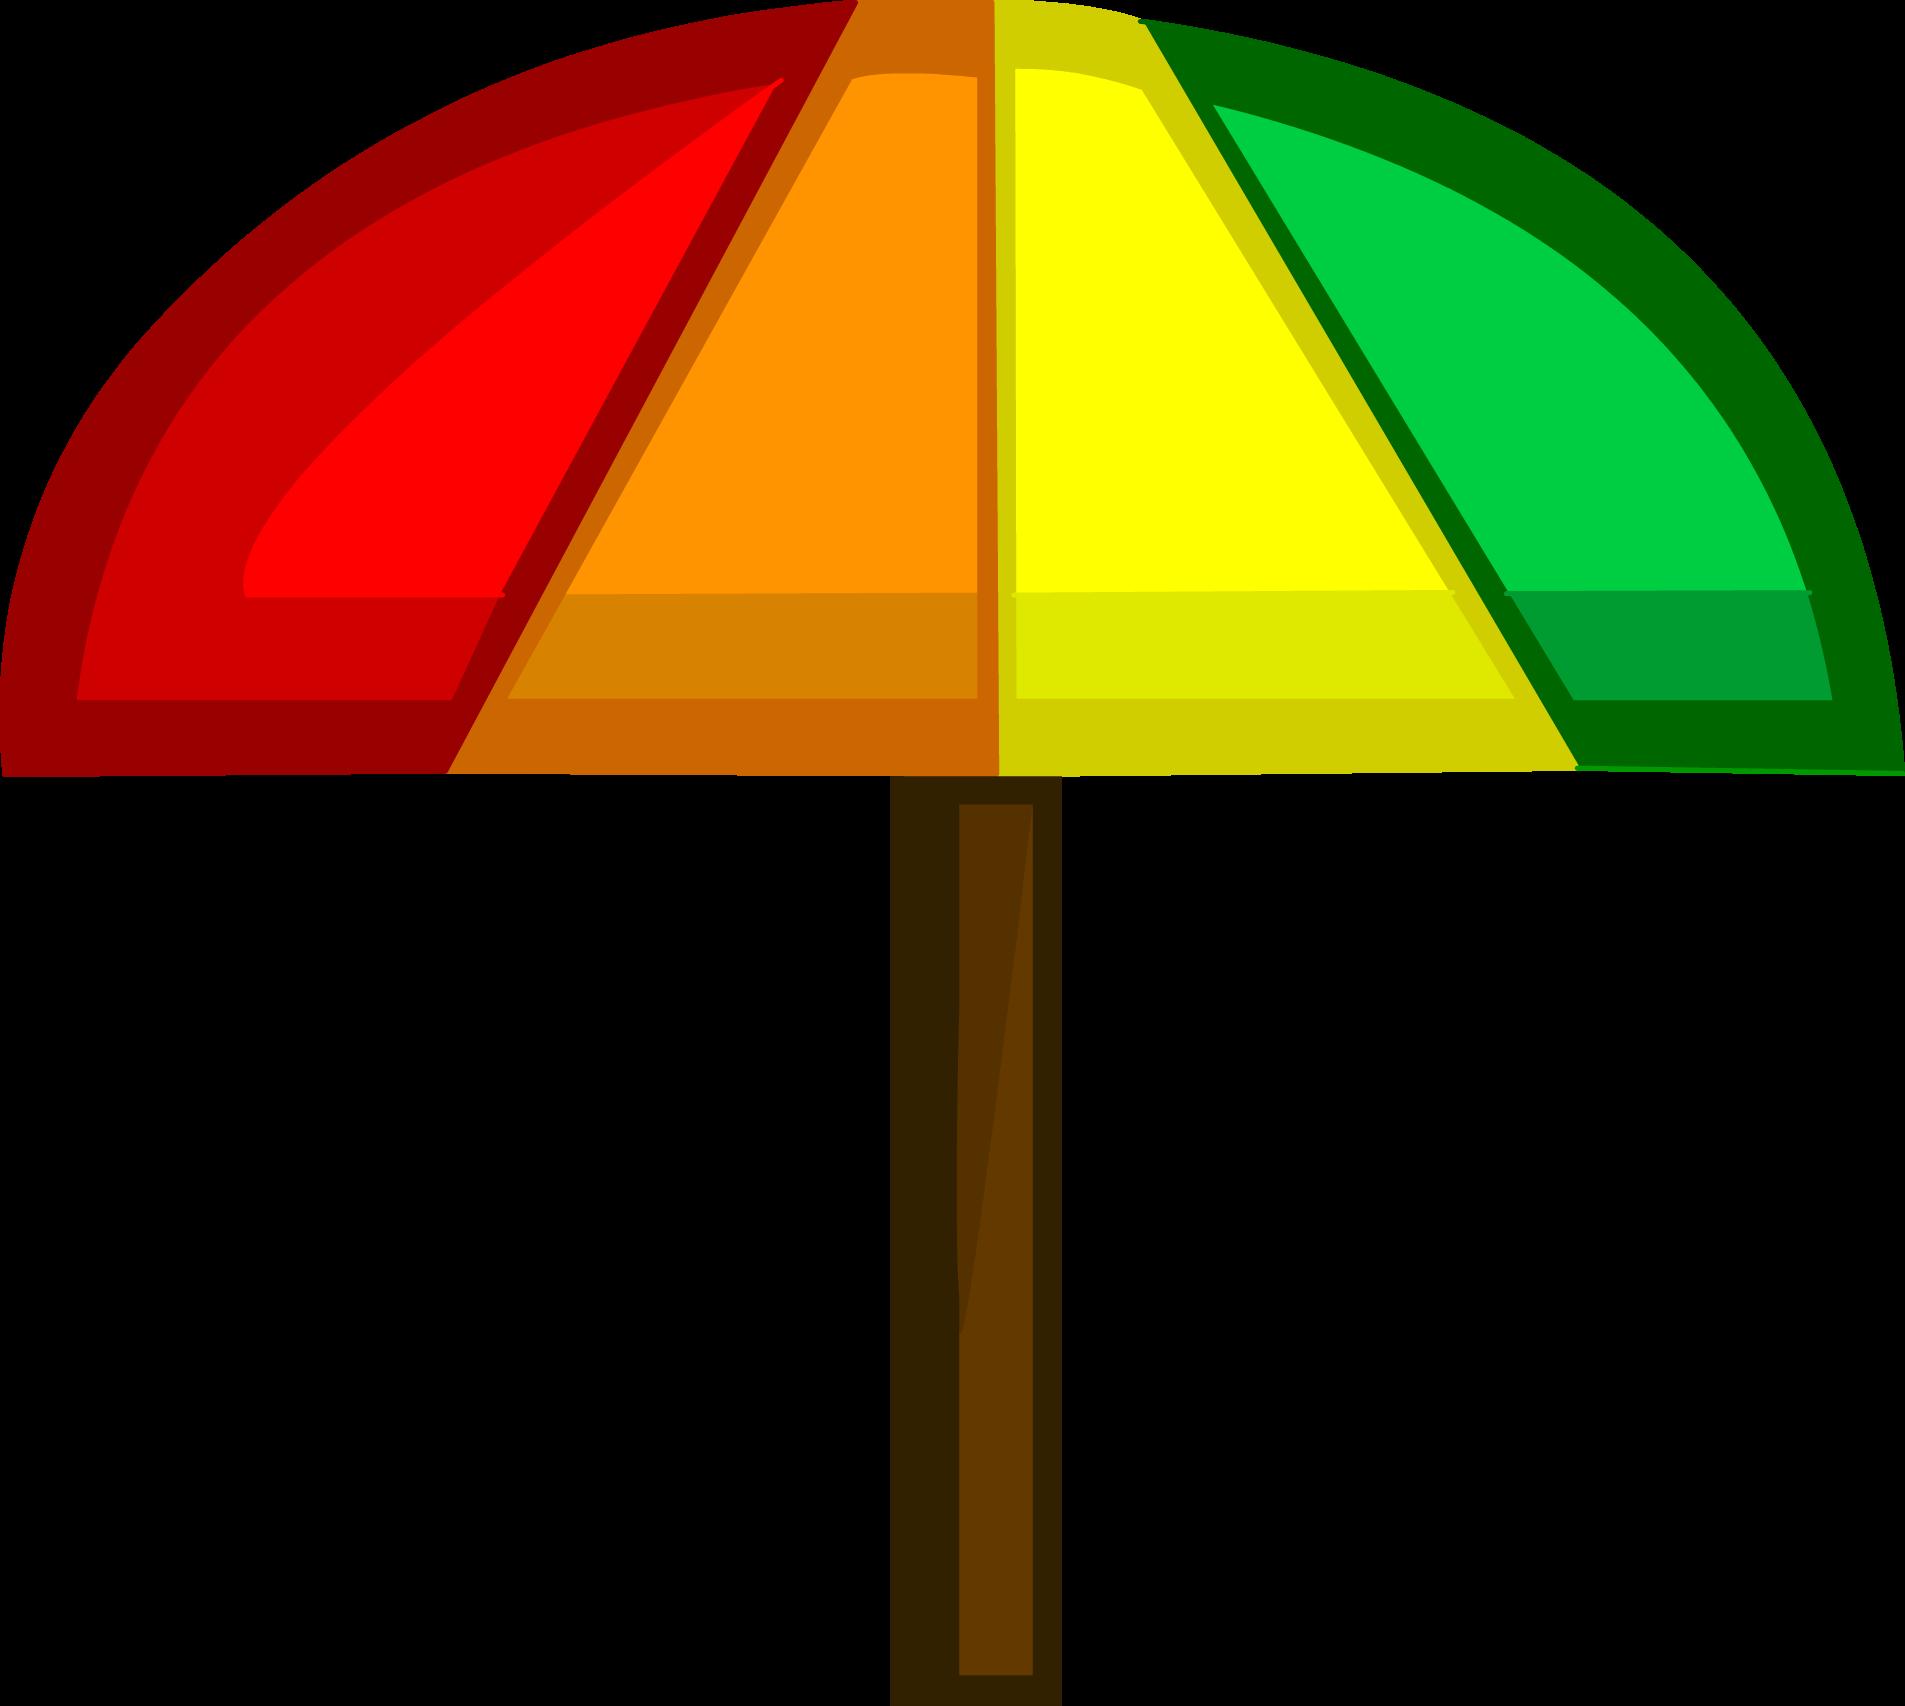 Image umbrela open body. Win clipart window shades